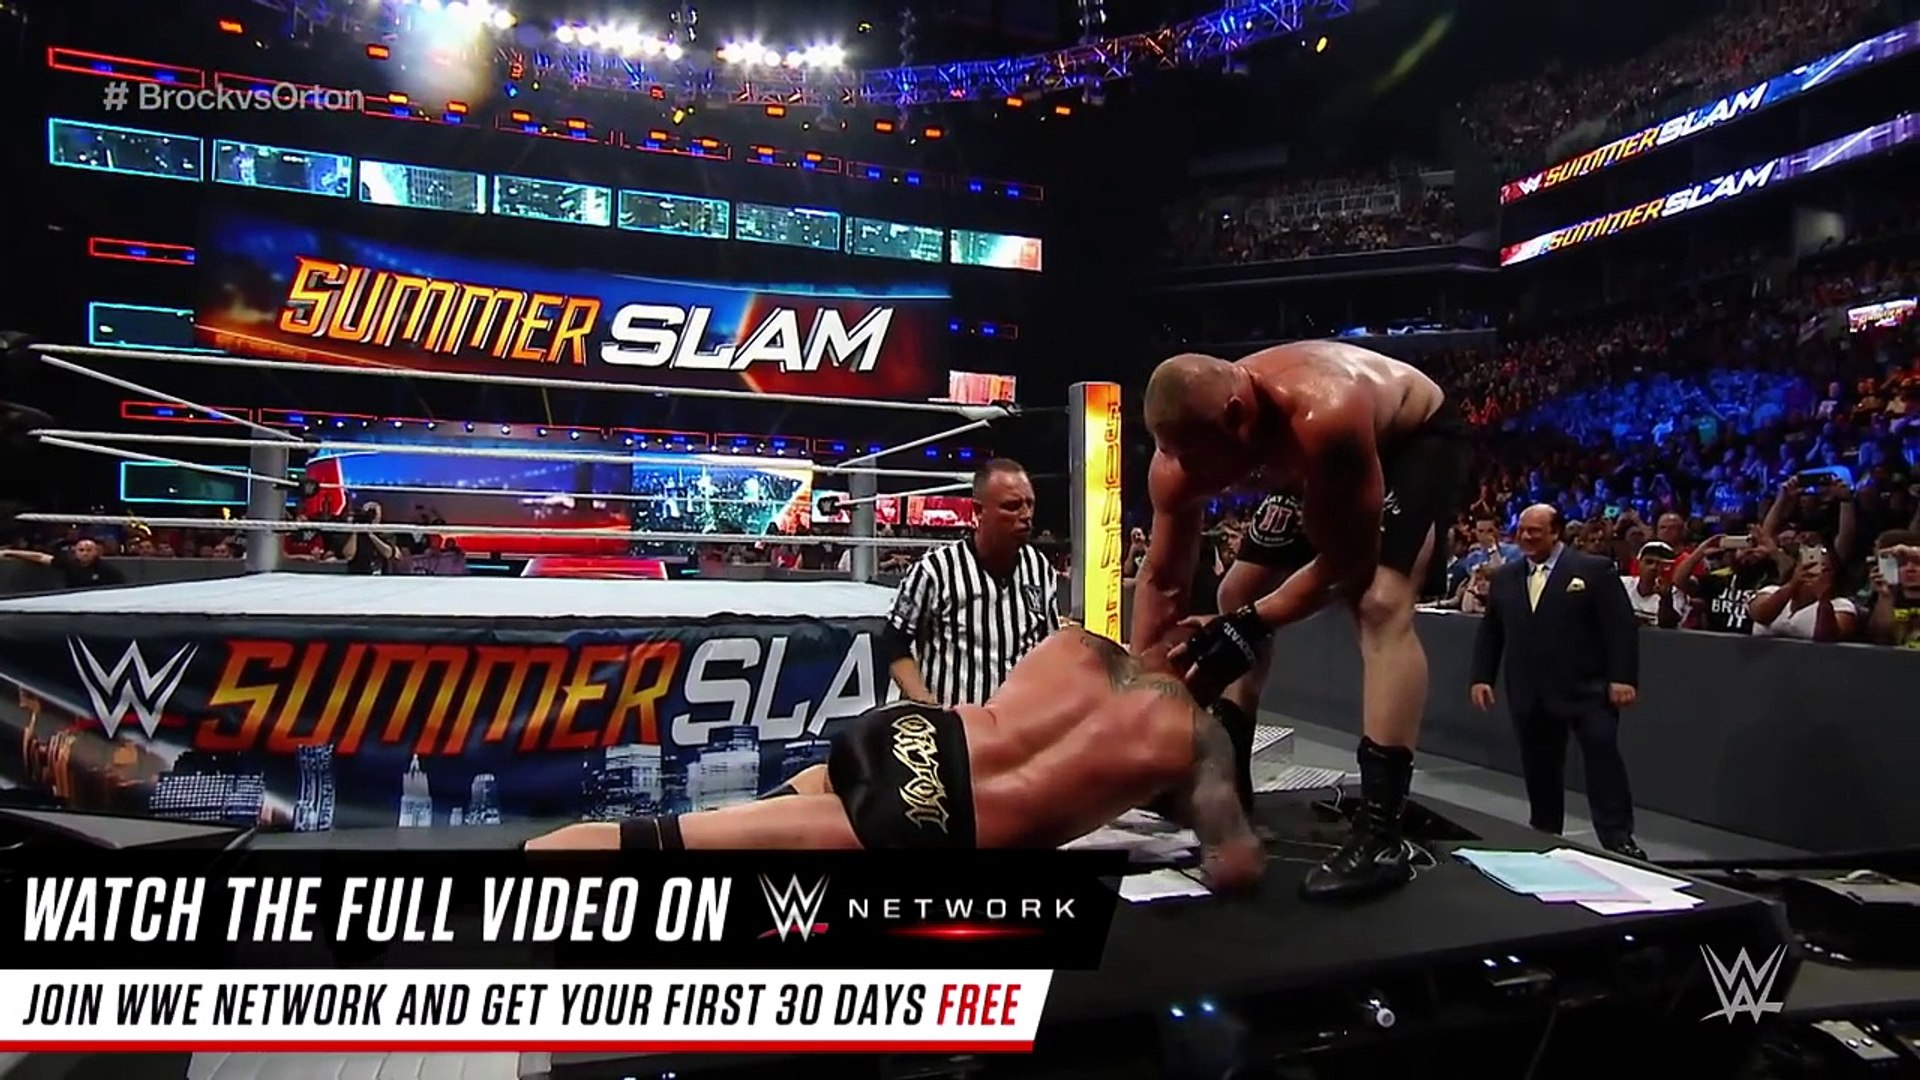 WWE Summerslam 2021 Reportedly Becoming Wrestlemania-Caliber Event 37